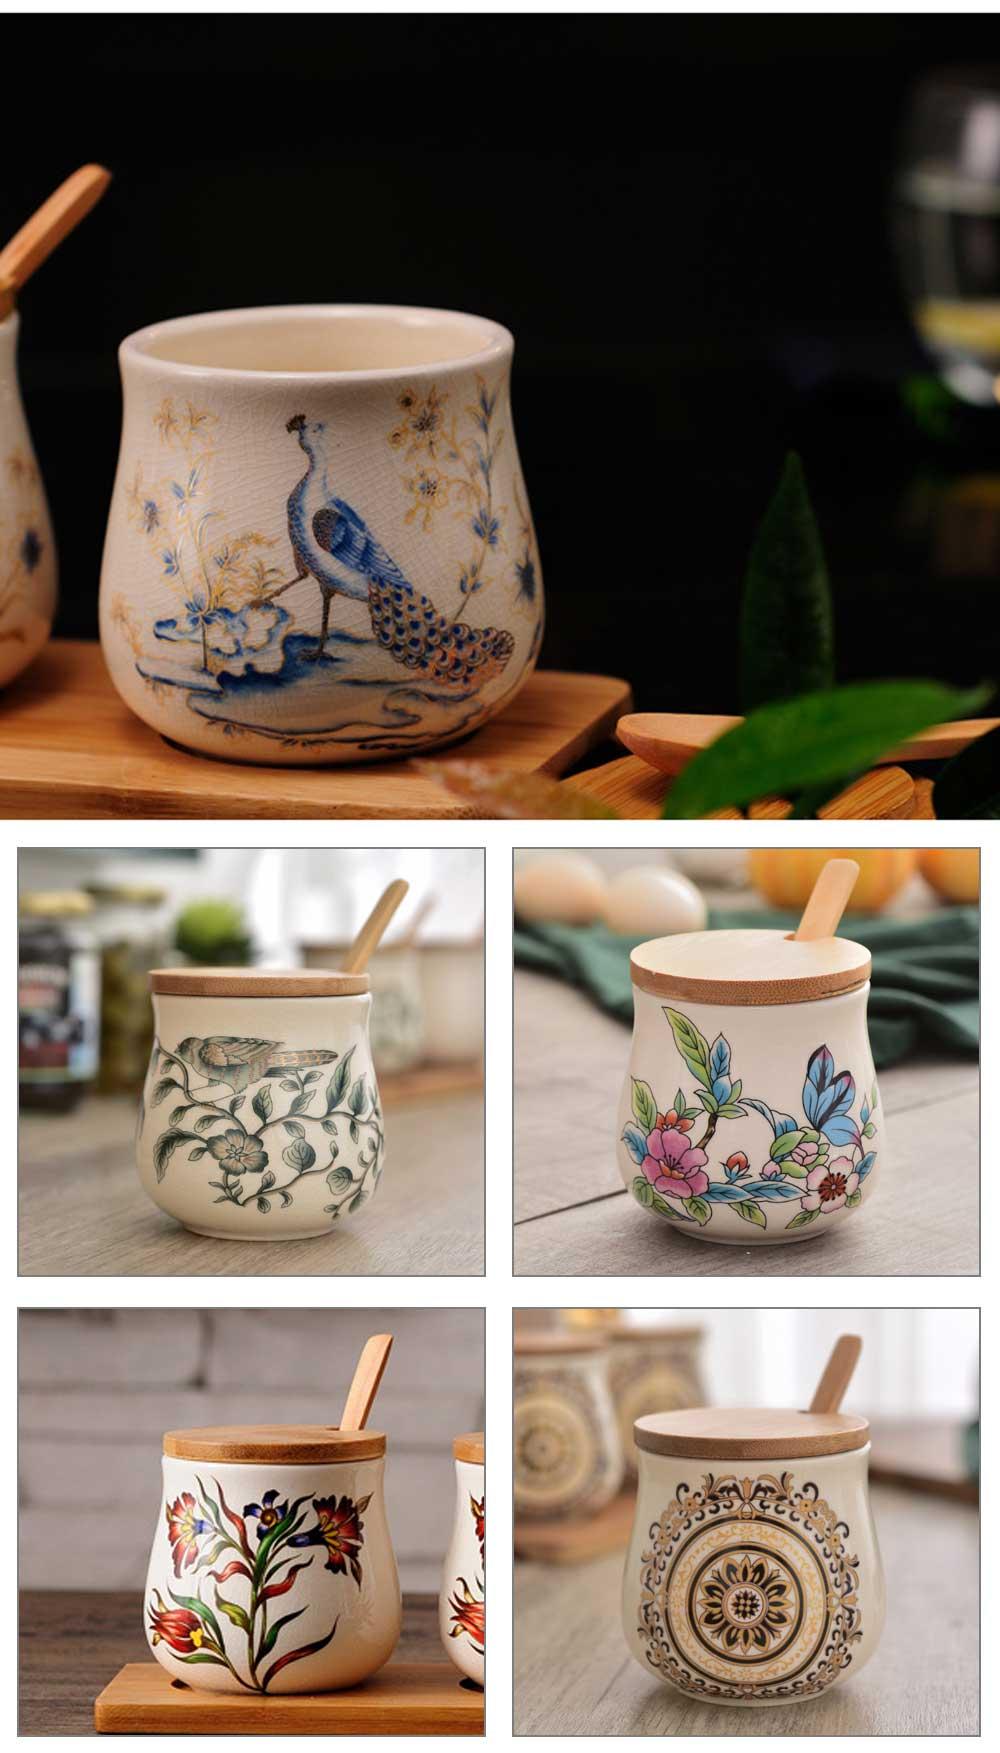 Three-piece Ceramic Seasoning Jar Set, Bamboo and Wood Ceramic Seasoning Bottle Set, with Wood Bracket 7